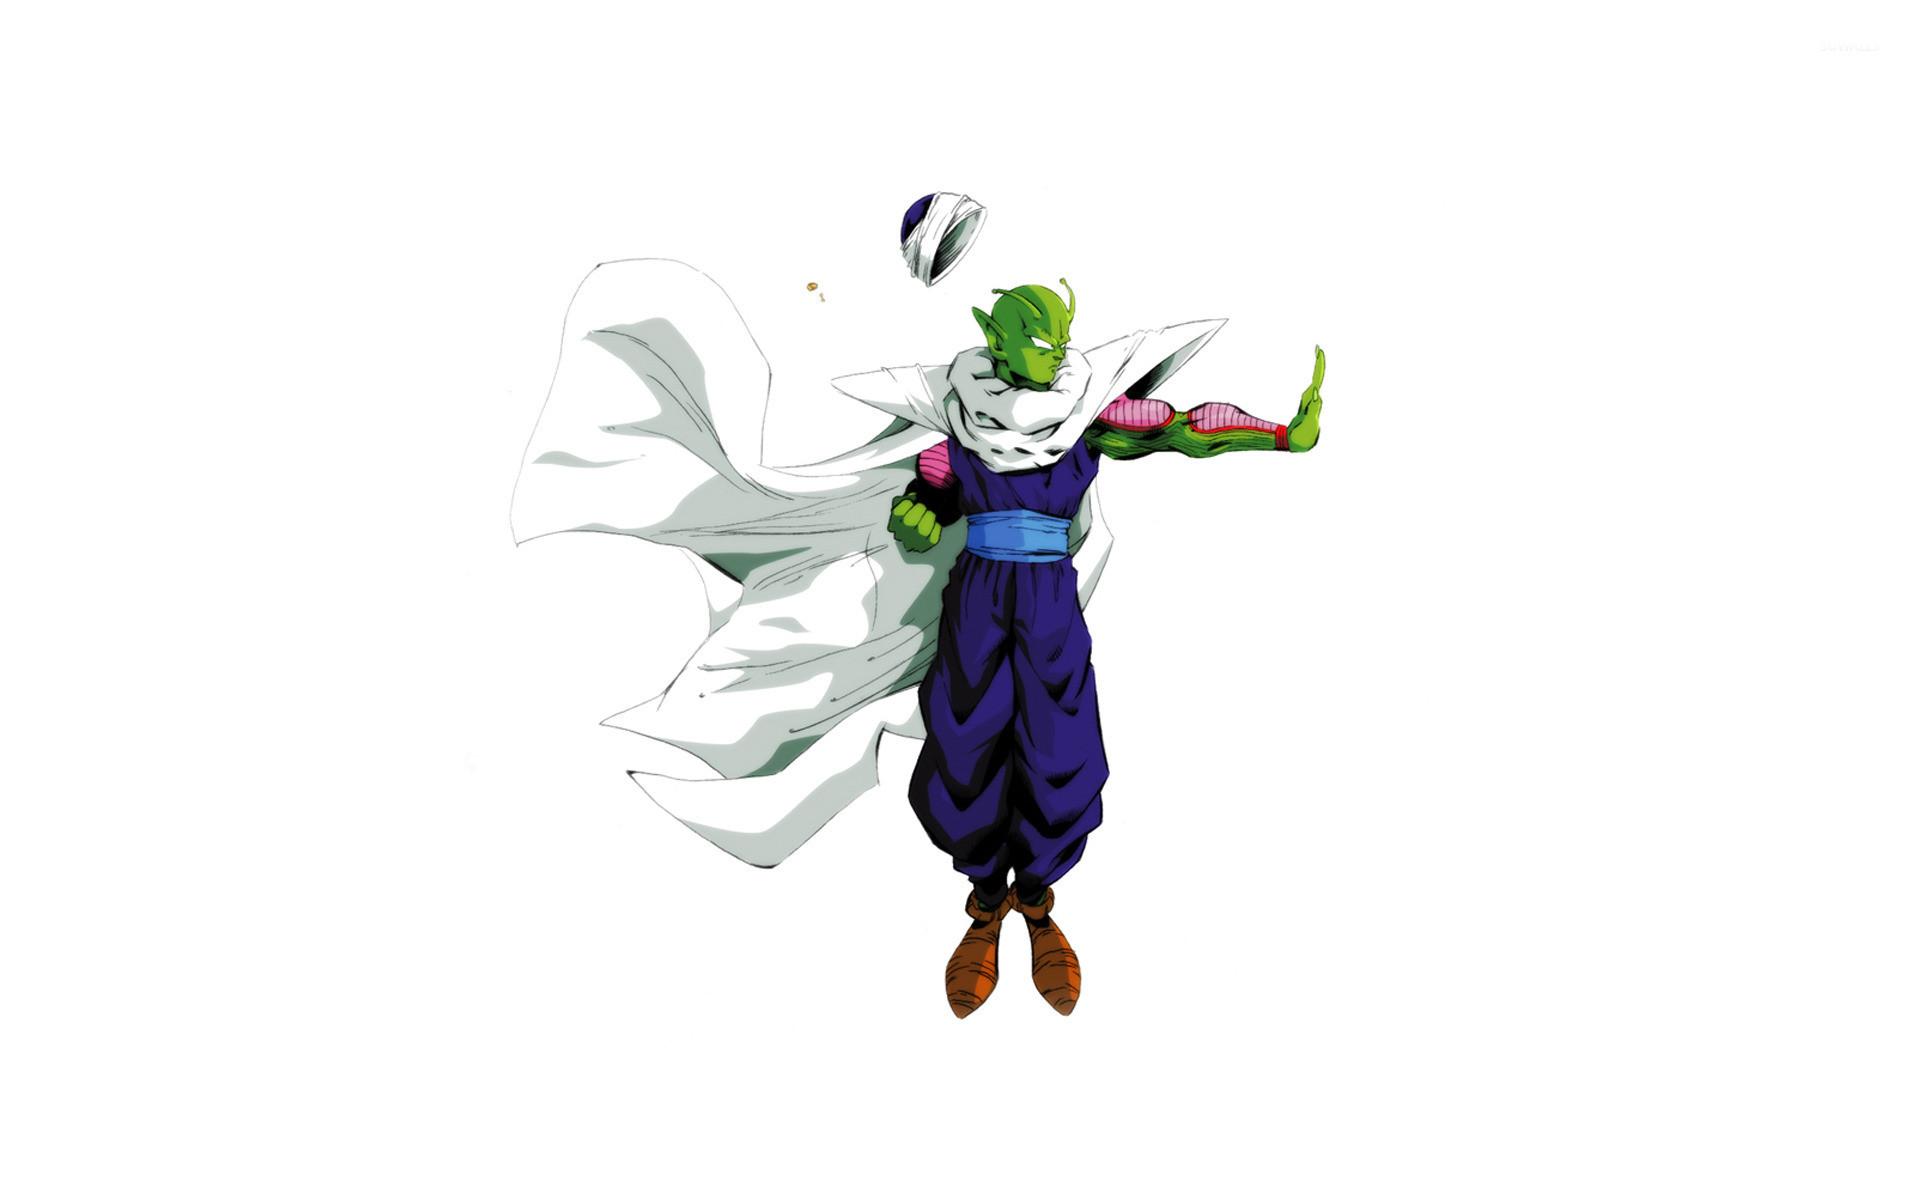 Dragon Ball Z Piccolo Wallpaper